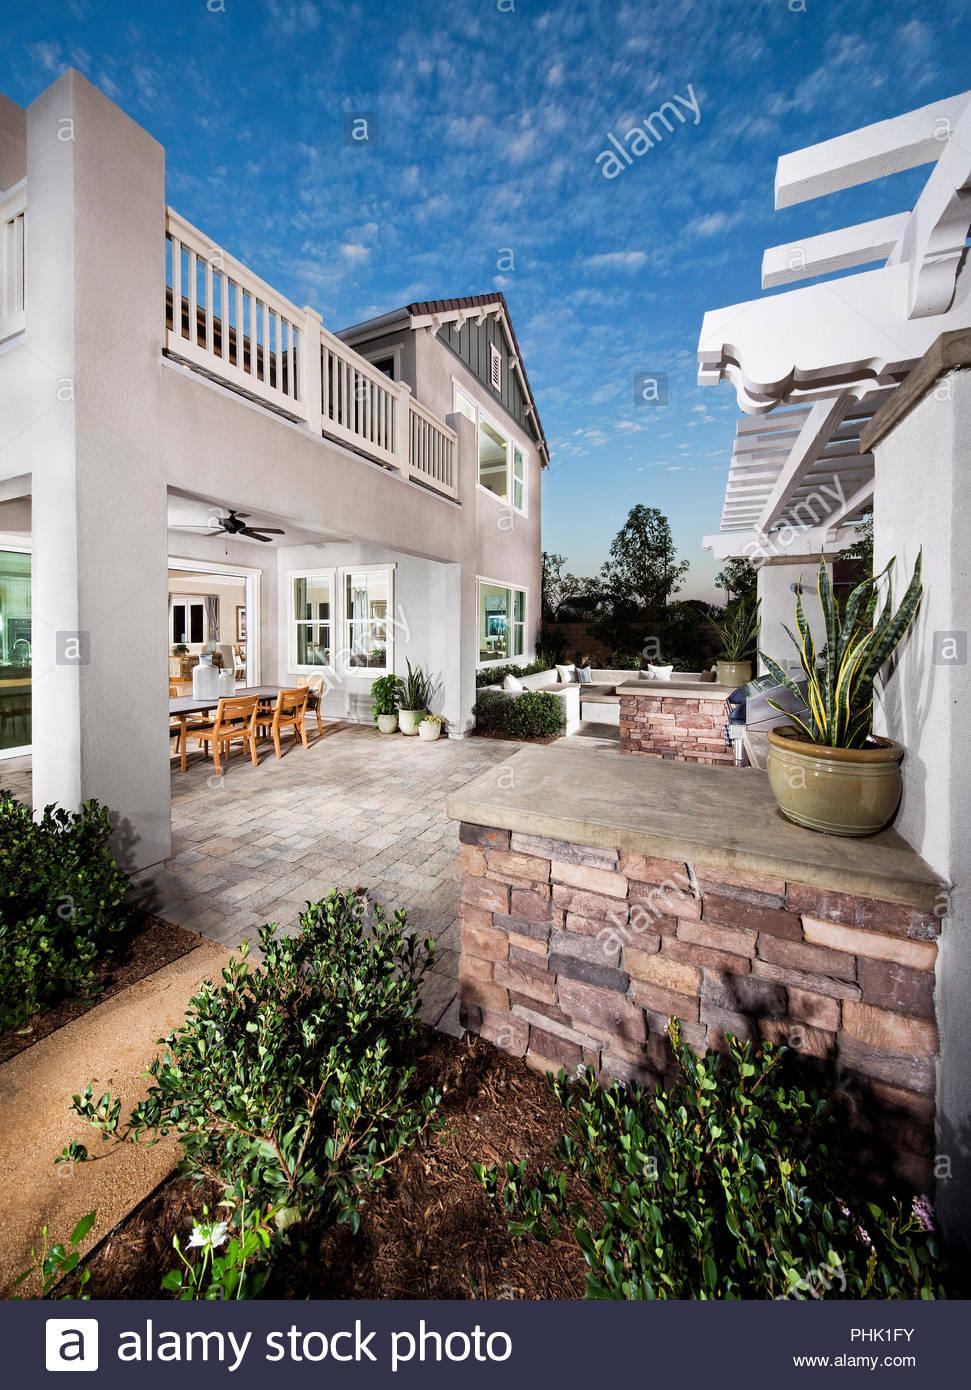 House and garden exterior - Stock Image